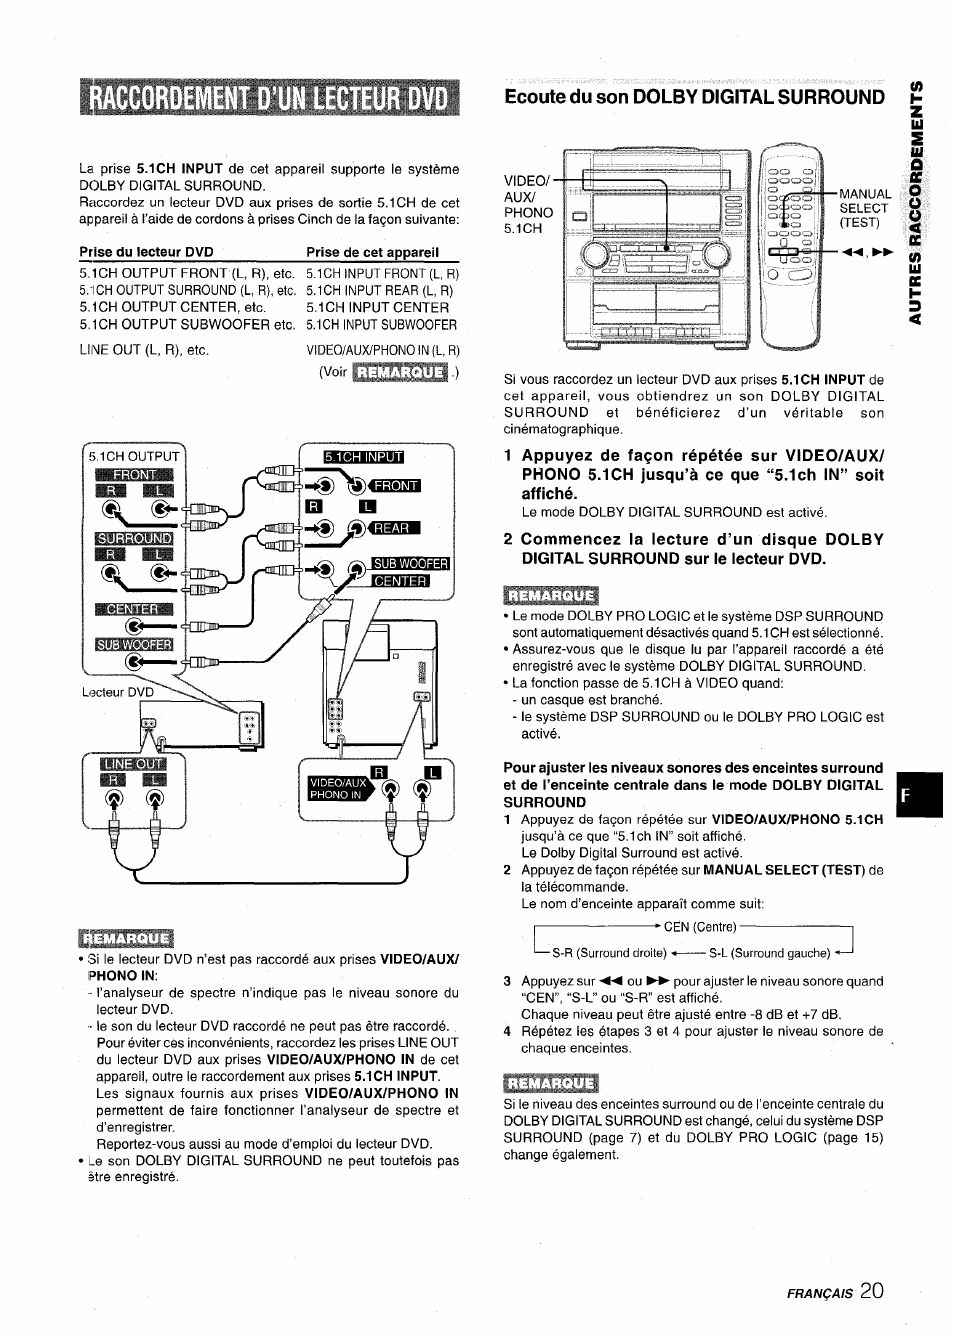 Ecoute du son dolby digital surround | Aiwa Z-VR55 User Manual